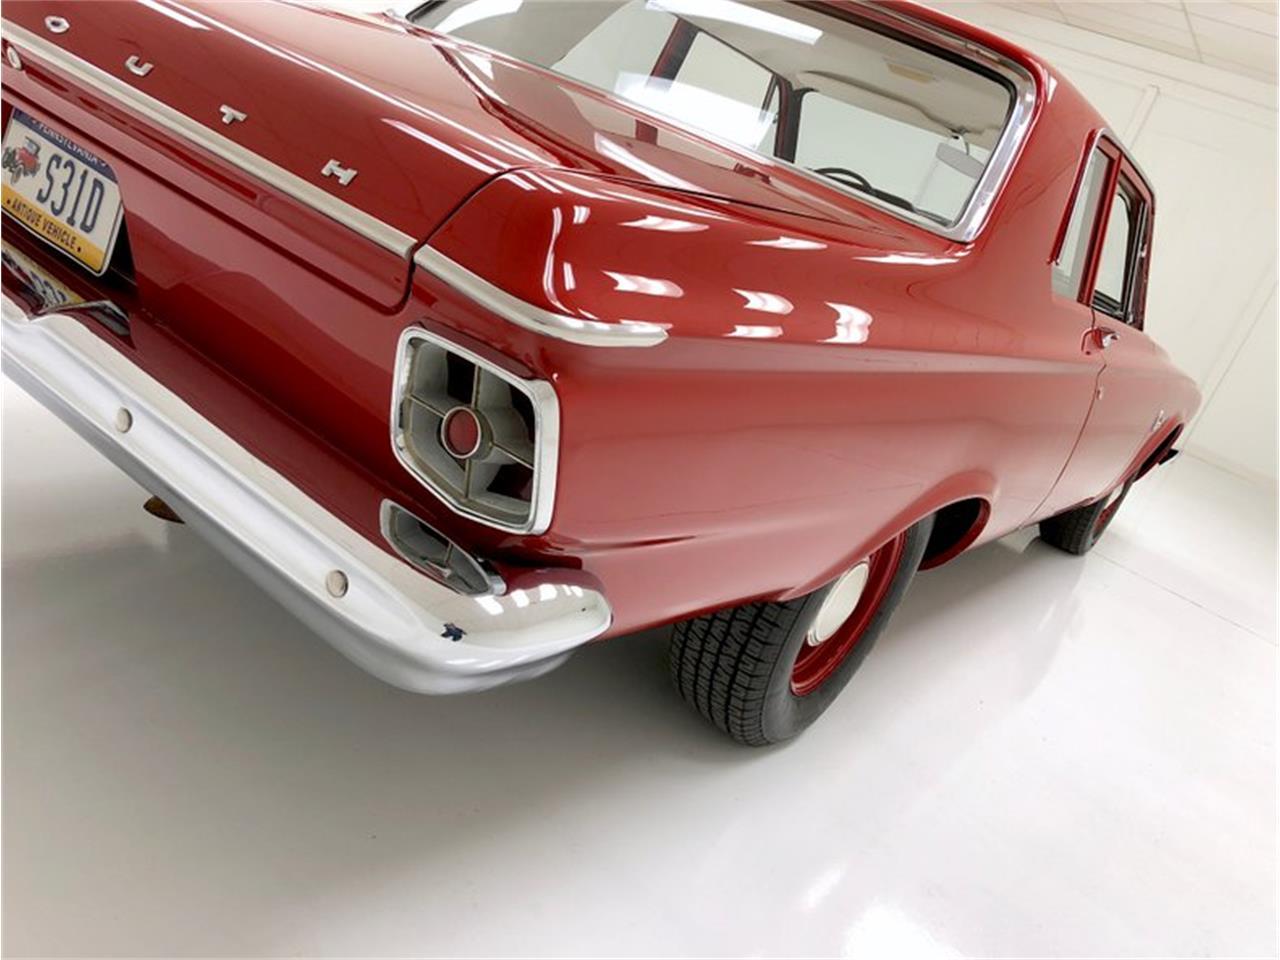 1963 Plymouth Savoy (CC-1367439) for sale in Morgantown, Pennsylvania